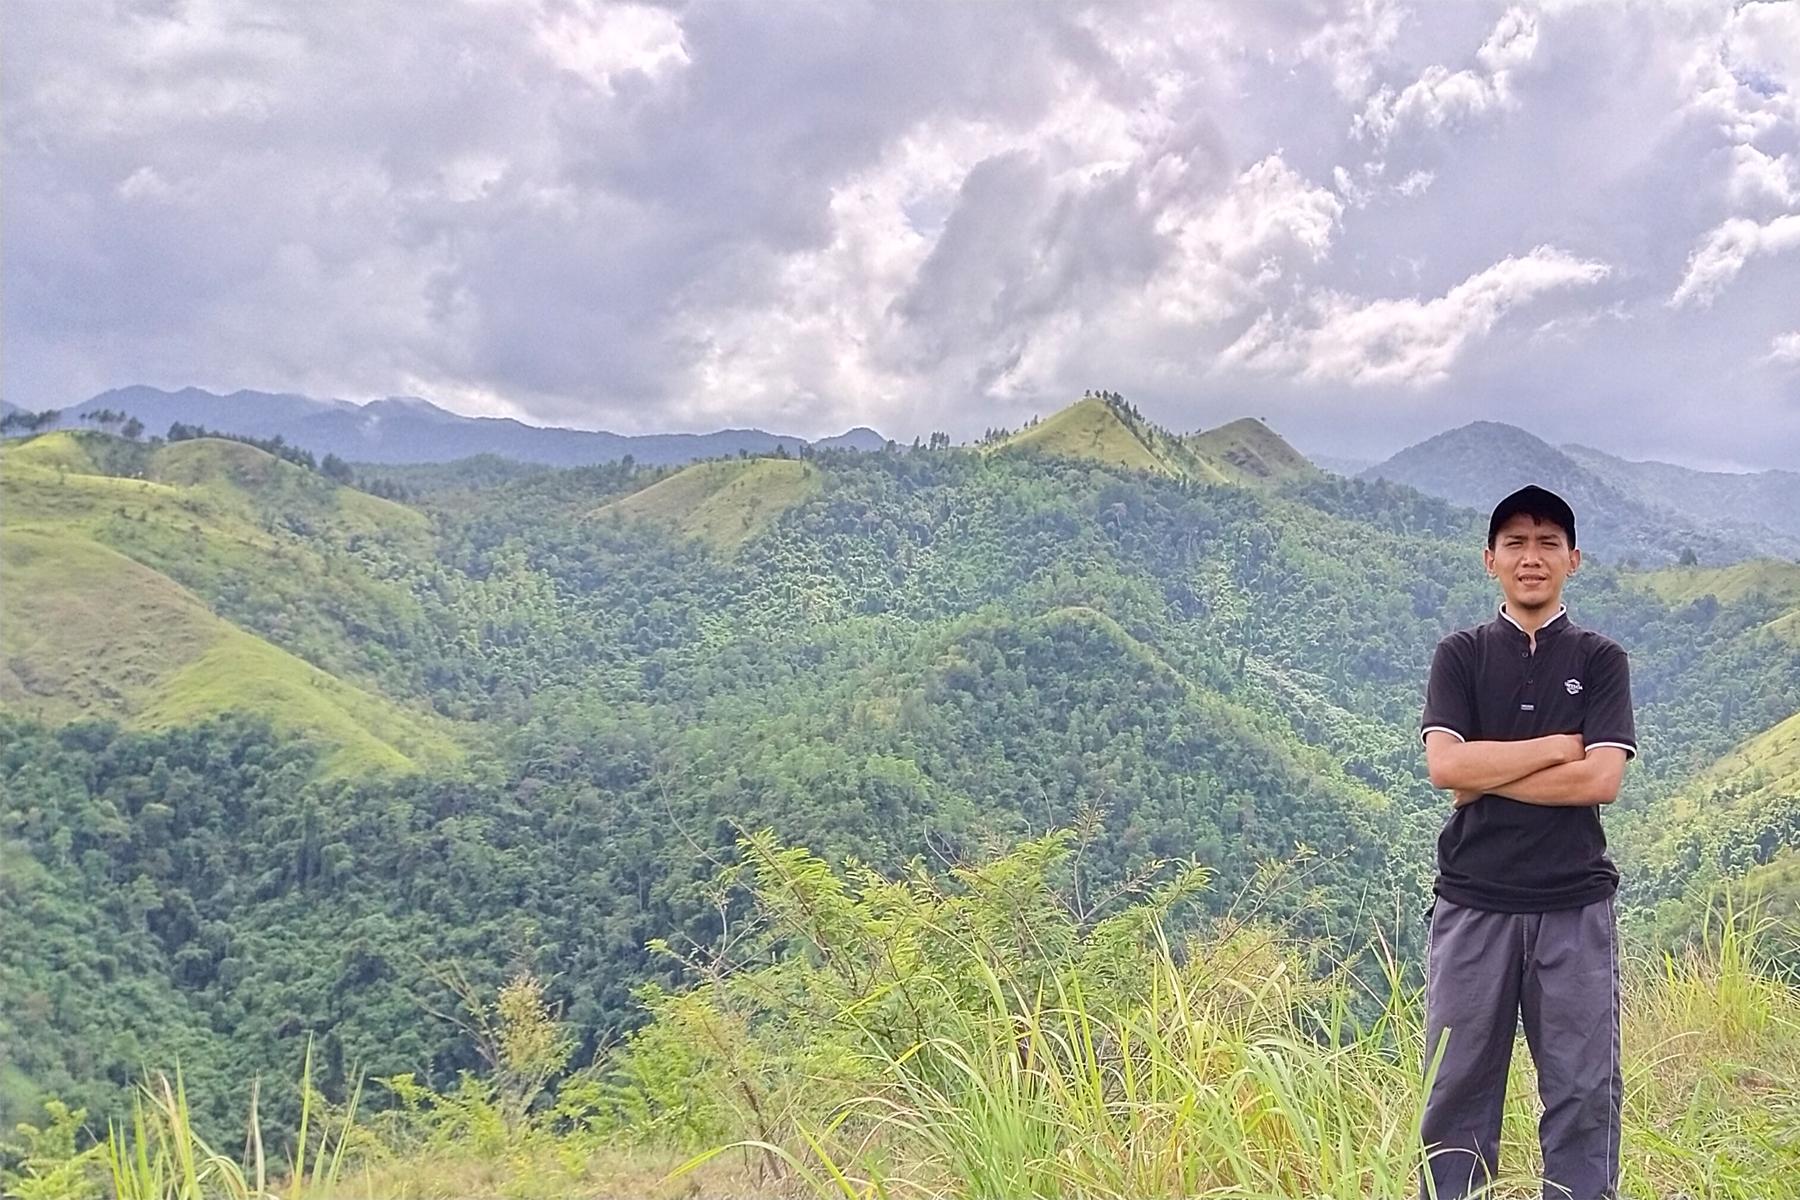 Mendaki Bukit Cot Goh Dua oleh Halolibur.com